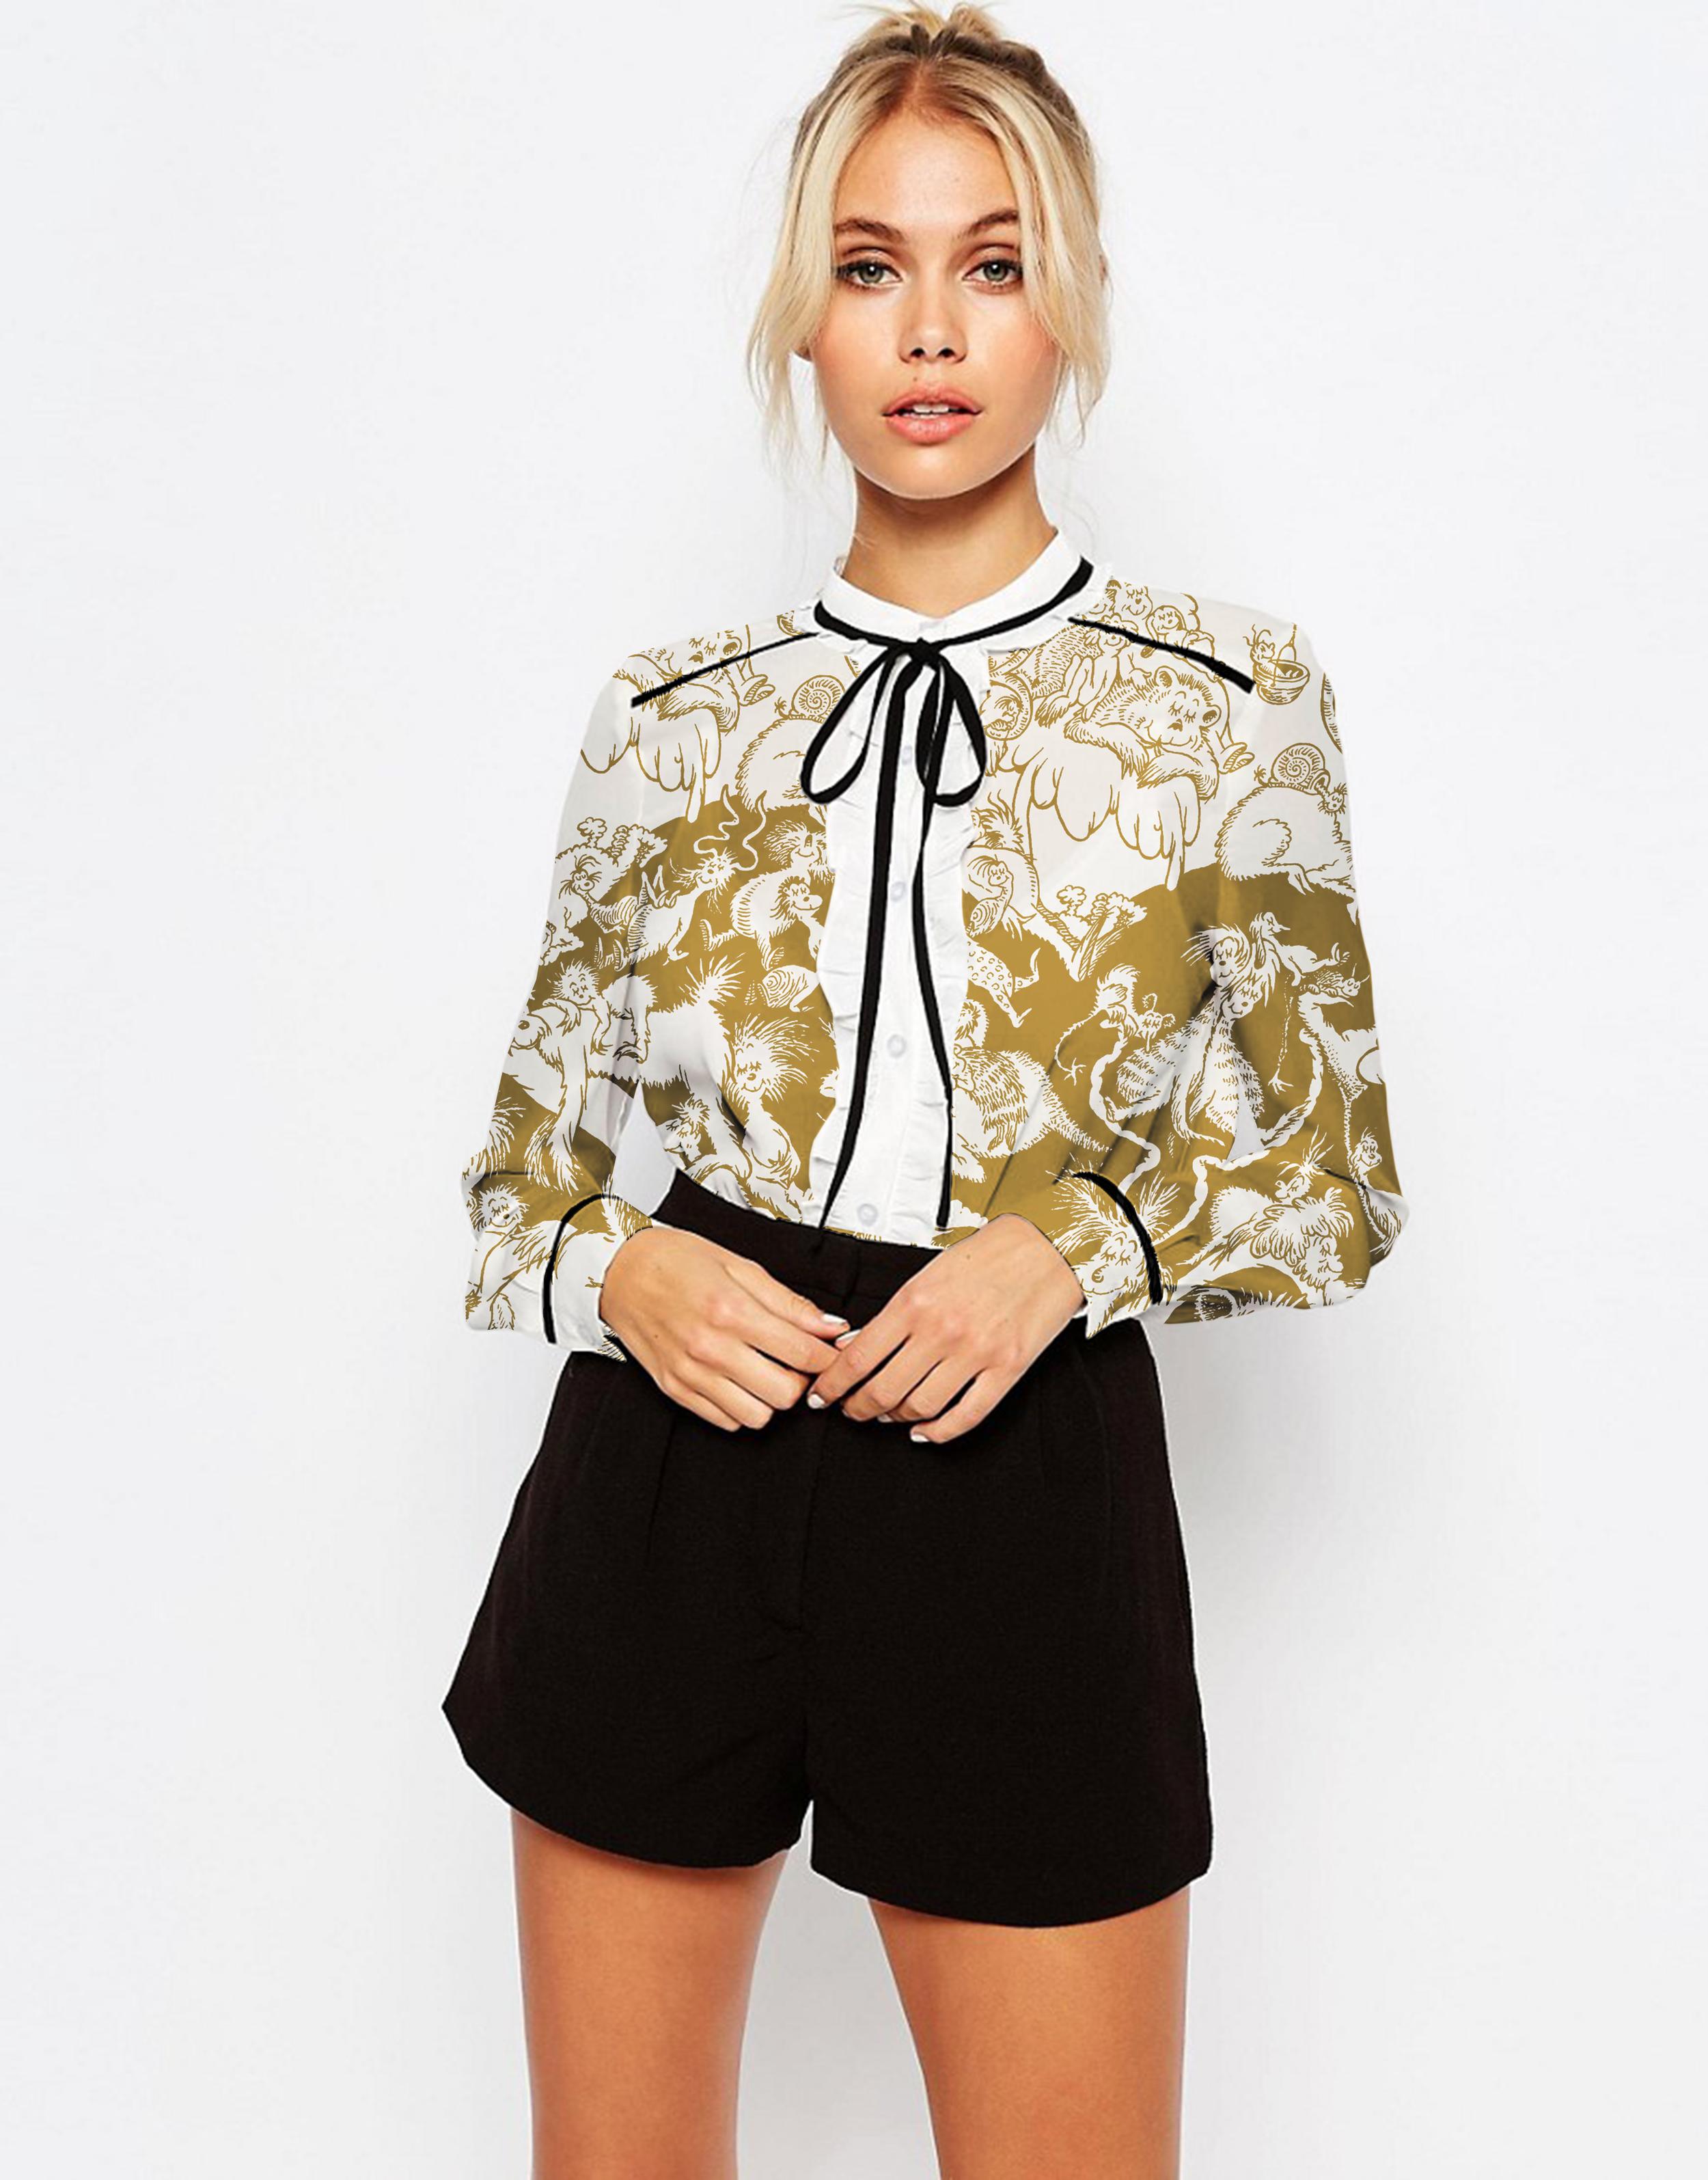 womens-shirt-1.png